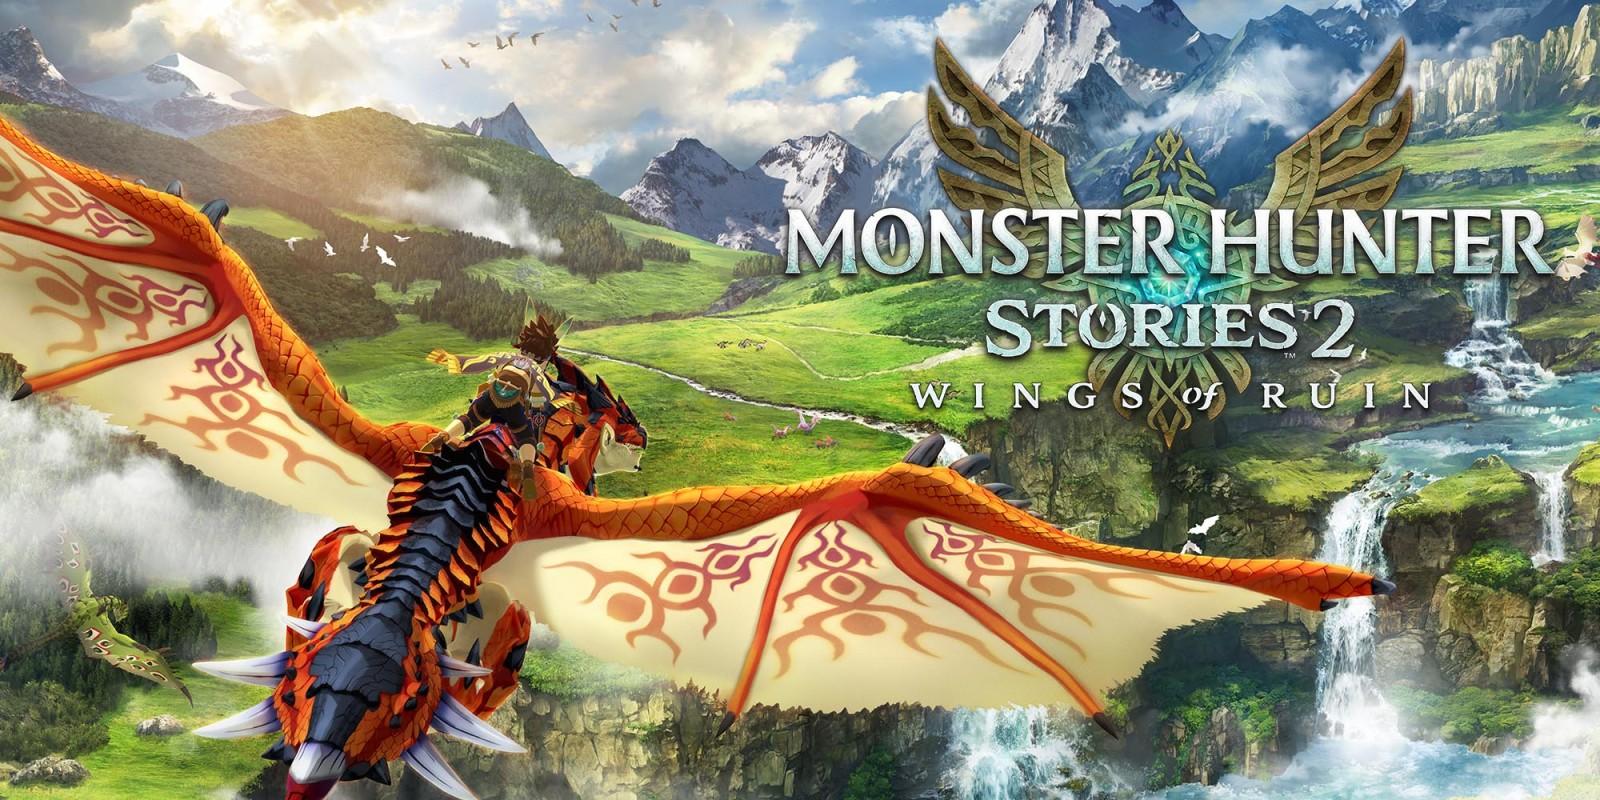 https://cdn02.nintendo-europe.com/media/images/10_share_images/games_15/nintendo_switch_4/H2x1_NSwitch_MonsterHunterStories2WingsOfRuin_image1600w.jpg